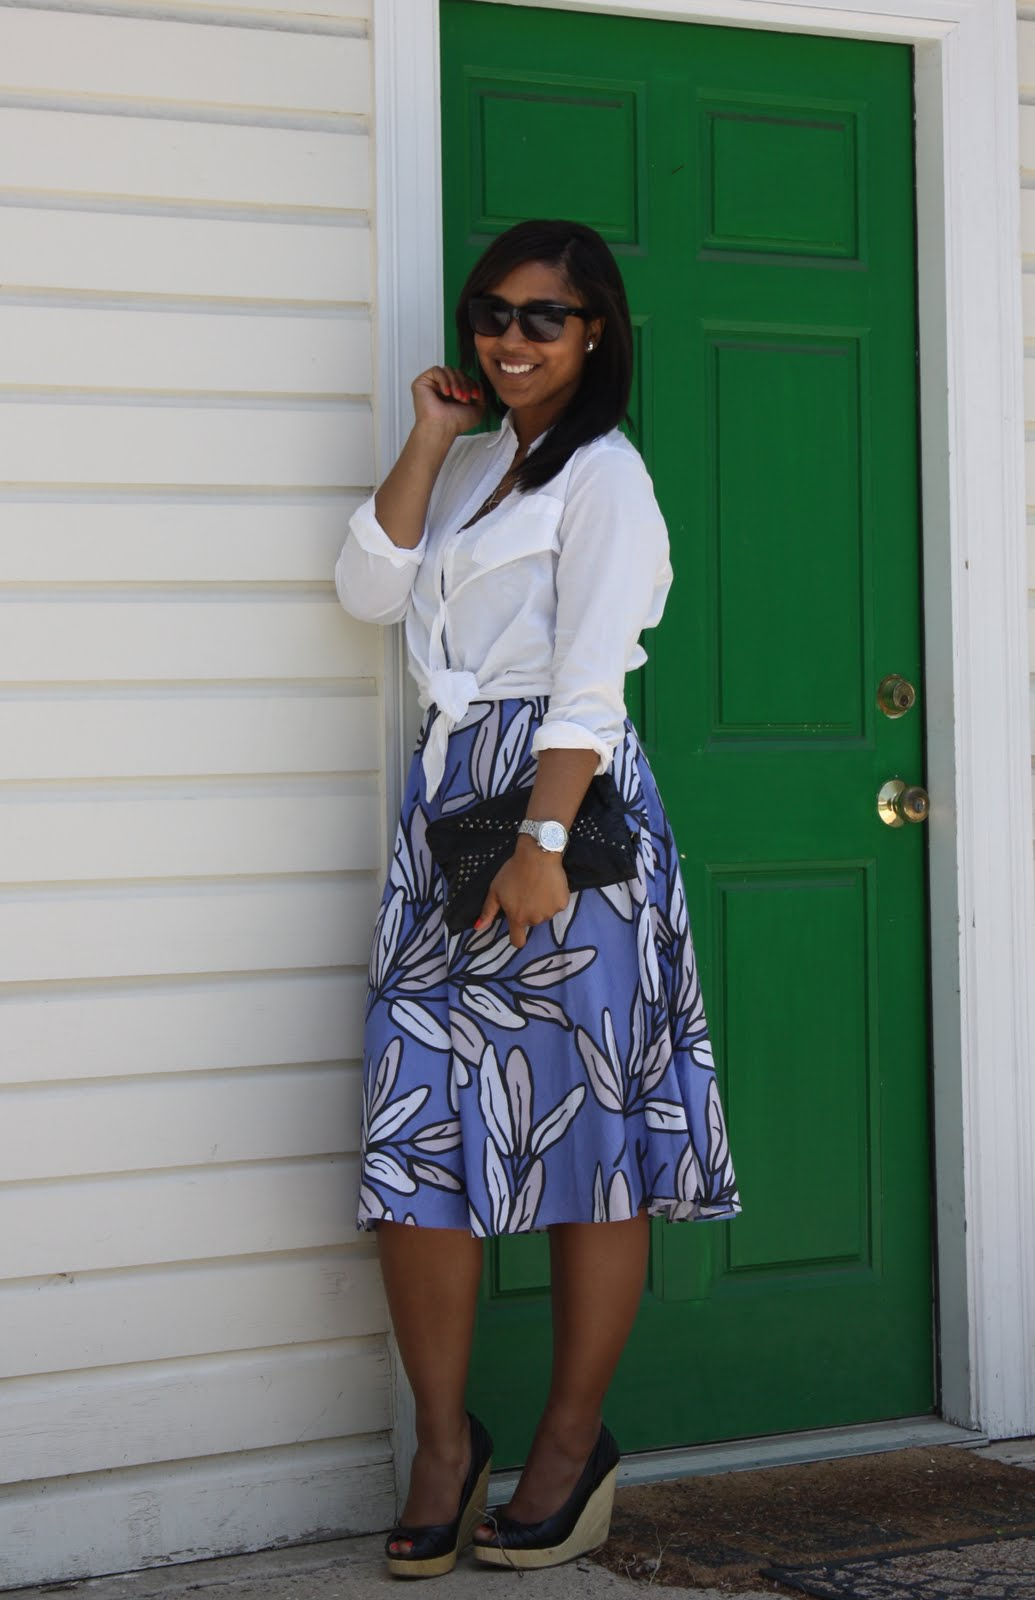 http://3.bp.blogspot.com/-R74birU1cLw/TbdTGhwF2rI/AAAAAAAAAhM/0EtsAJHB1m8/s1600/green+door+full+smiling.jpg